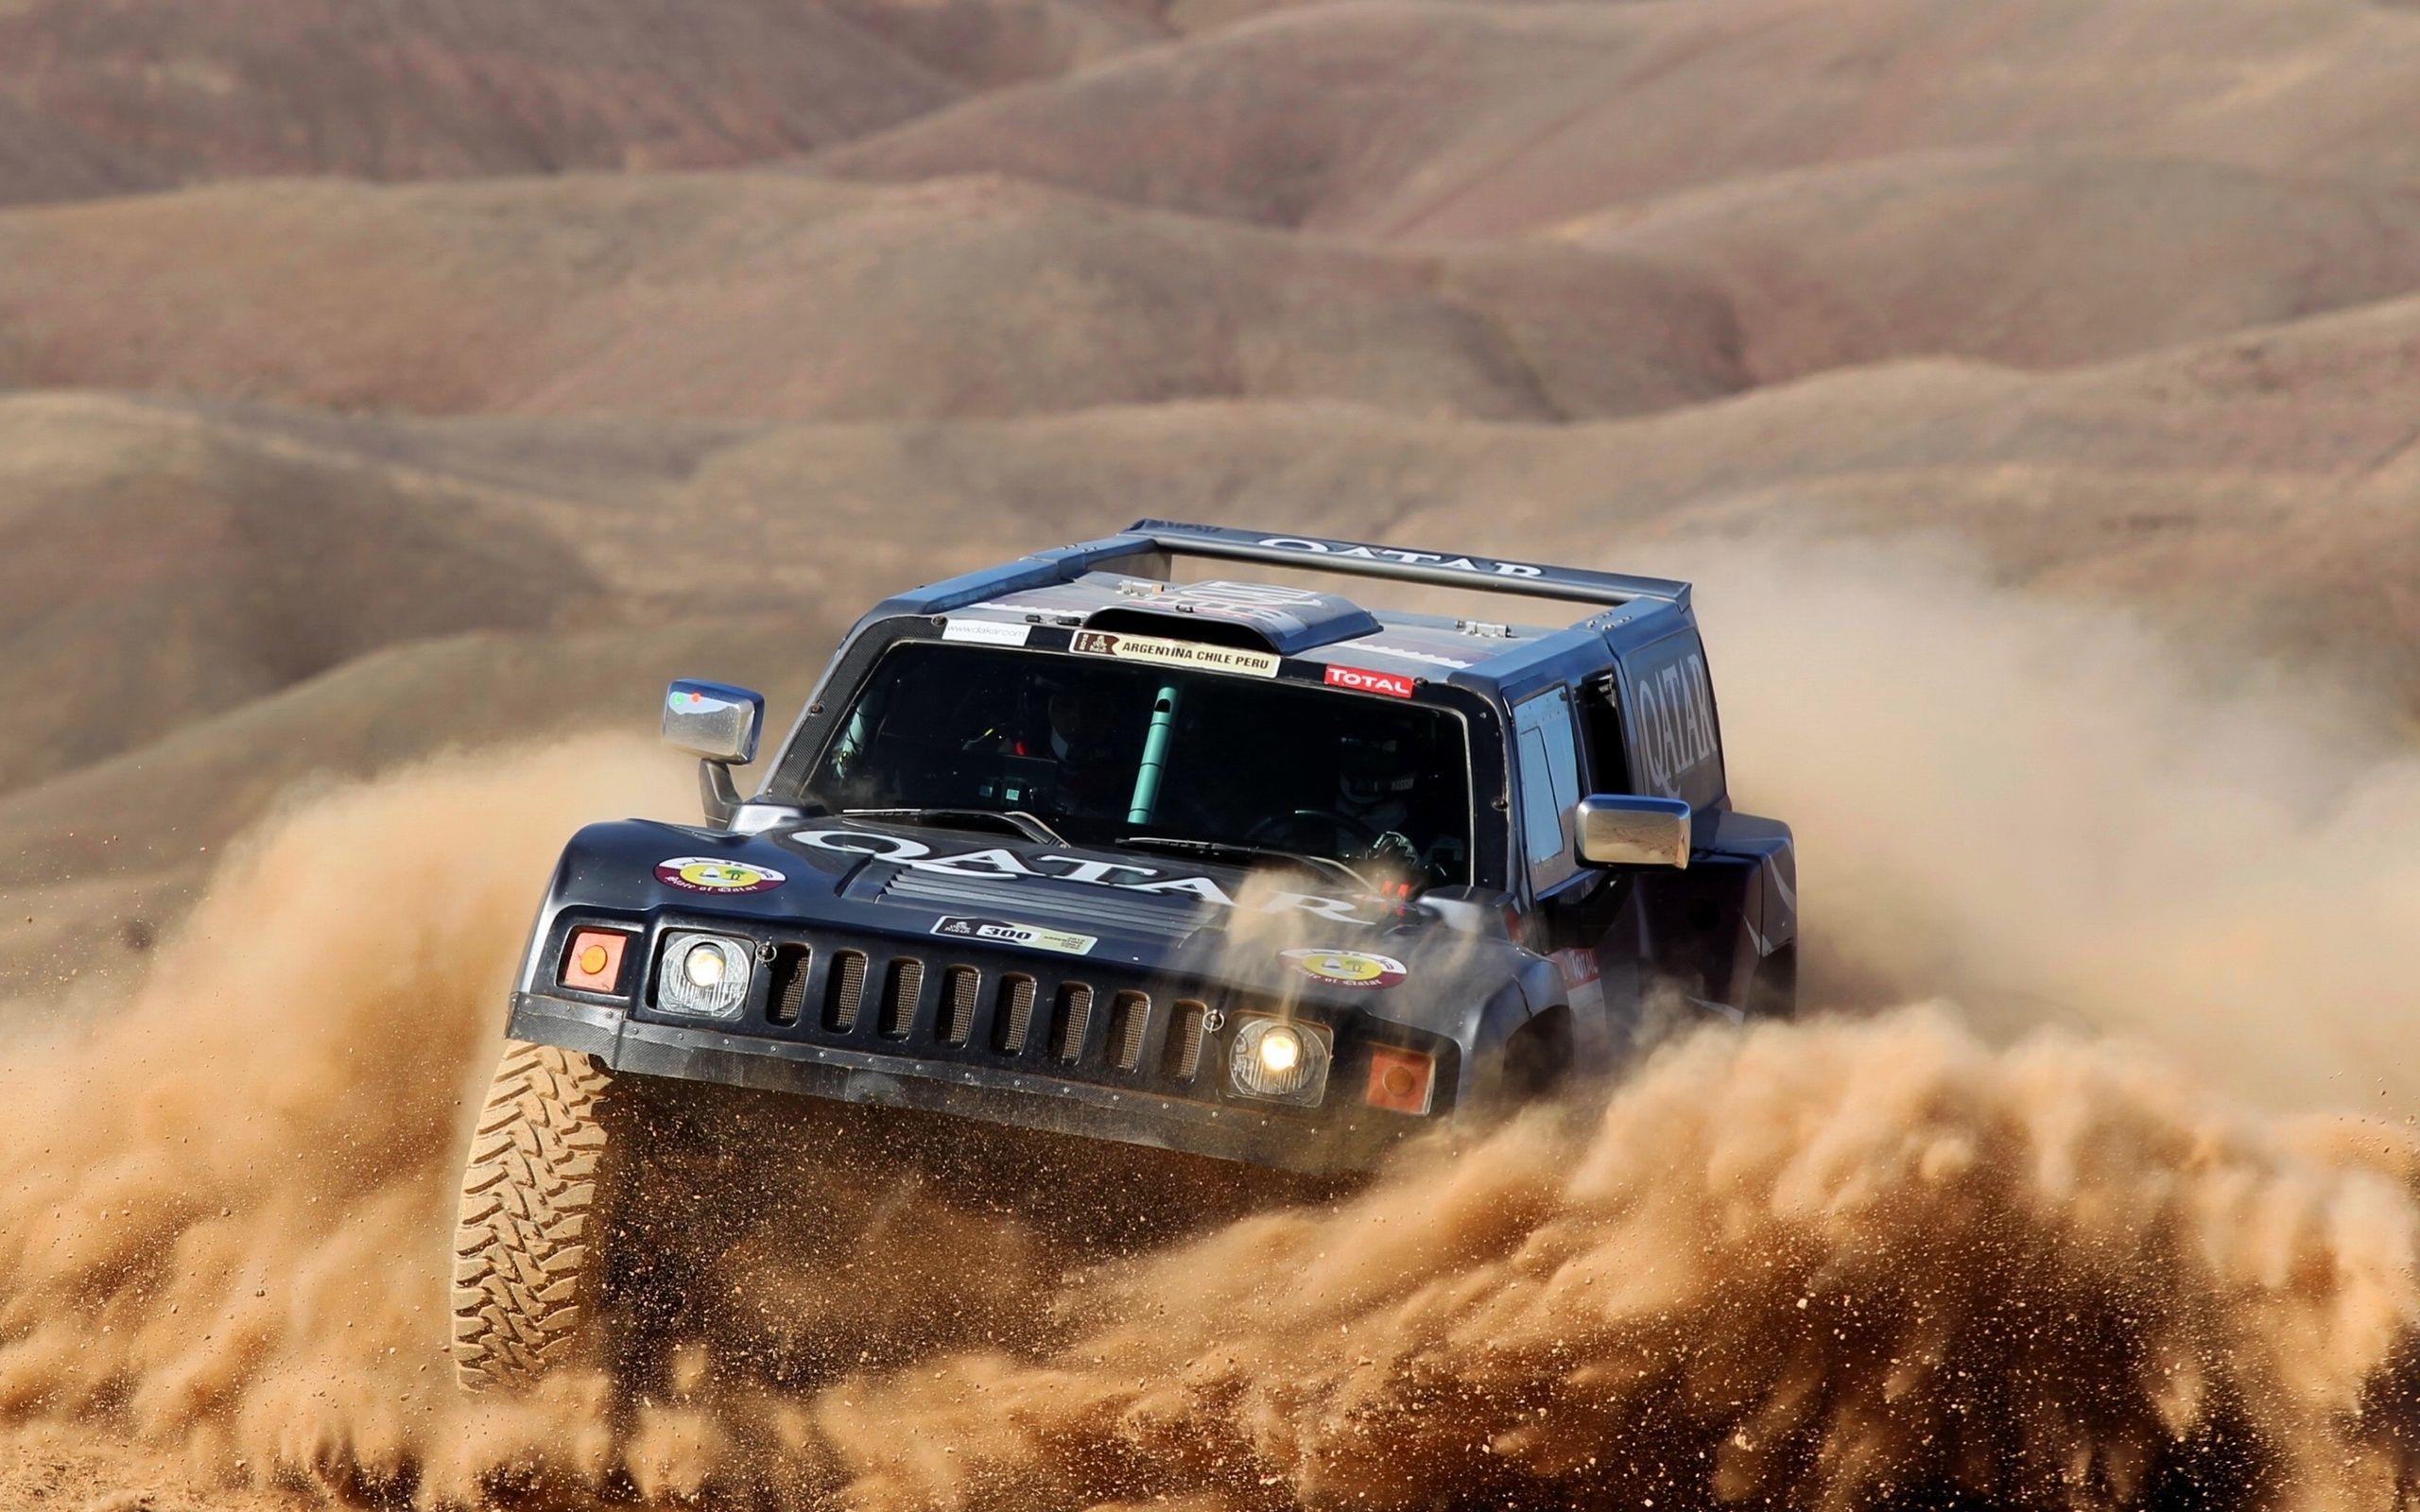 Hummer In Desert Rally Hummer Toy Car Dakar